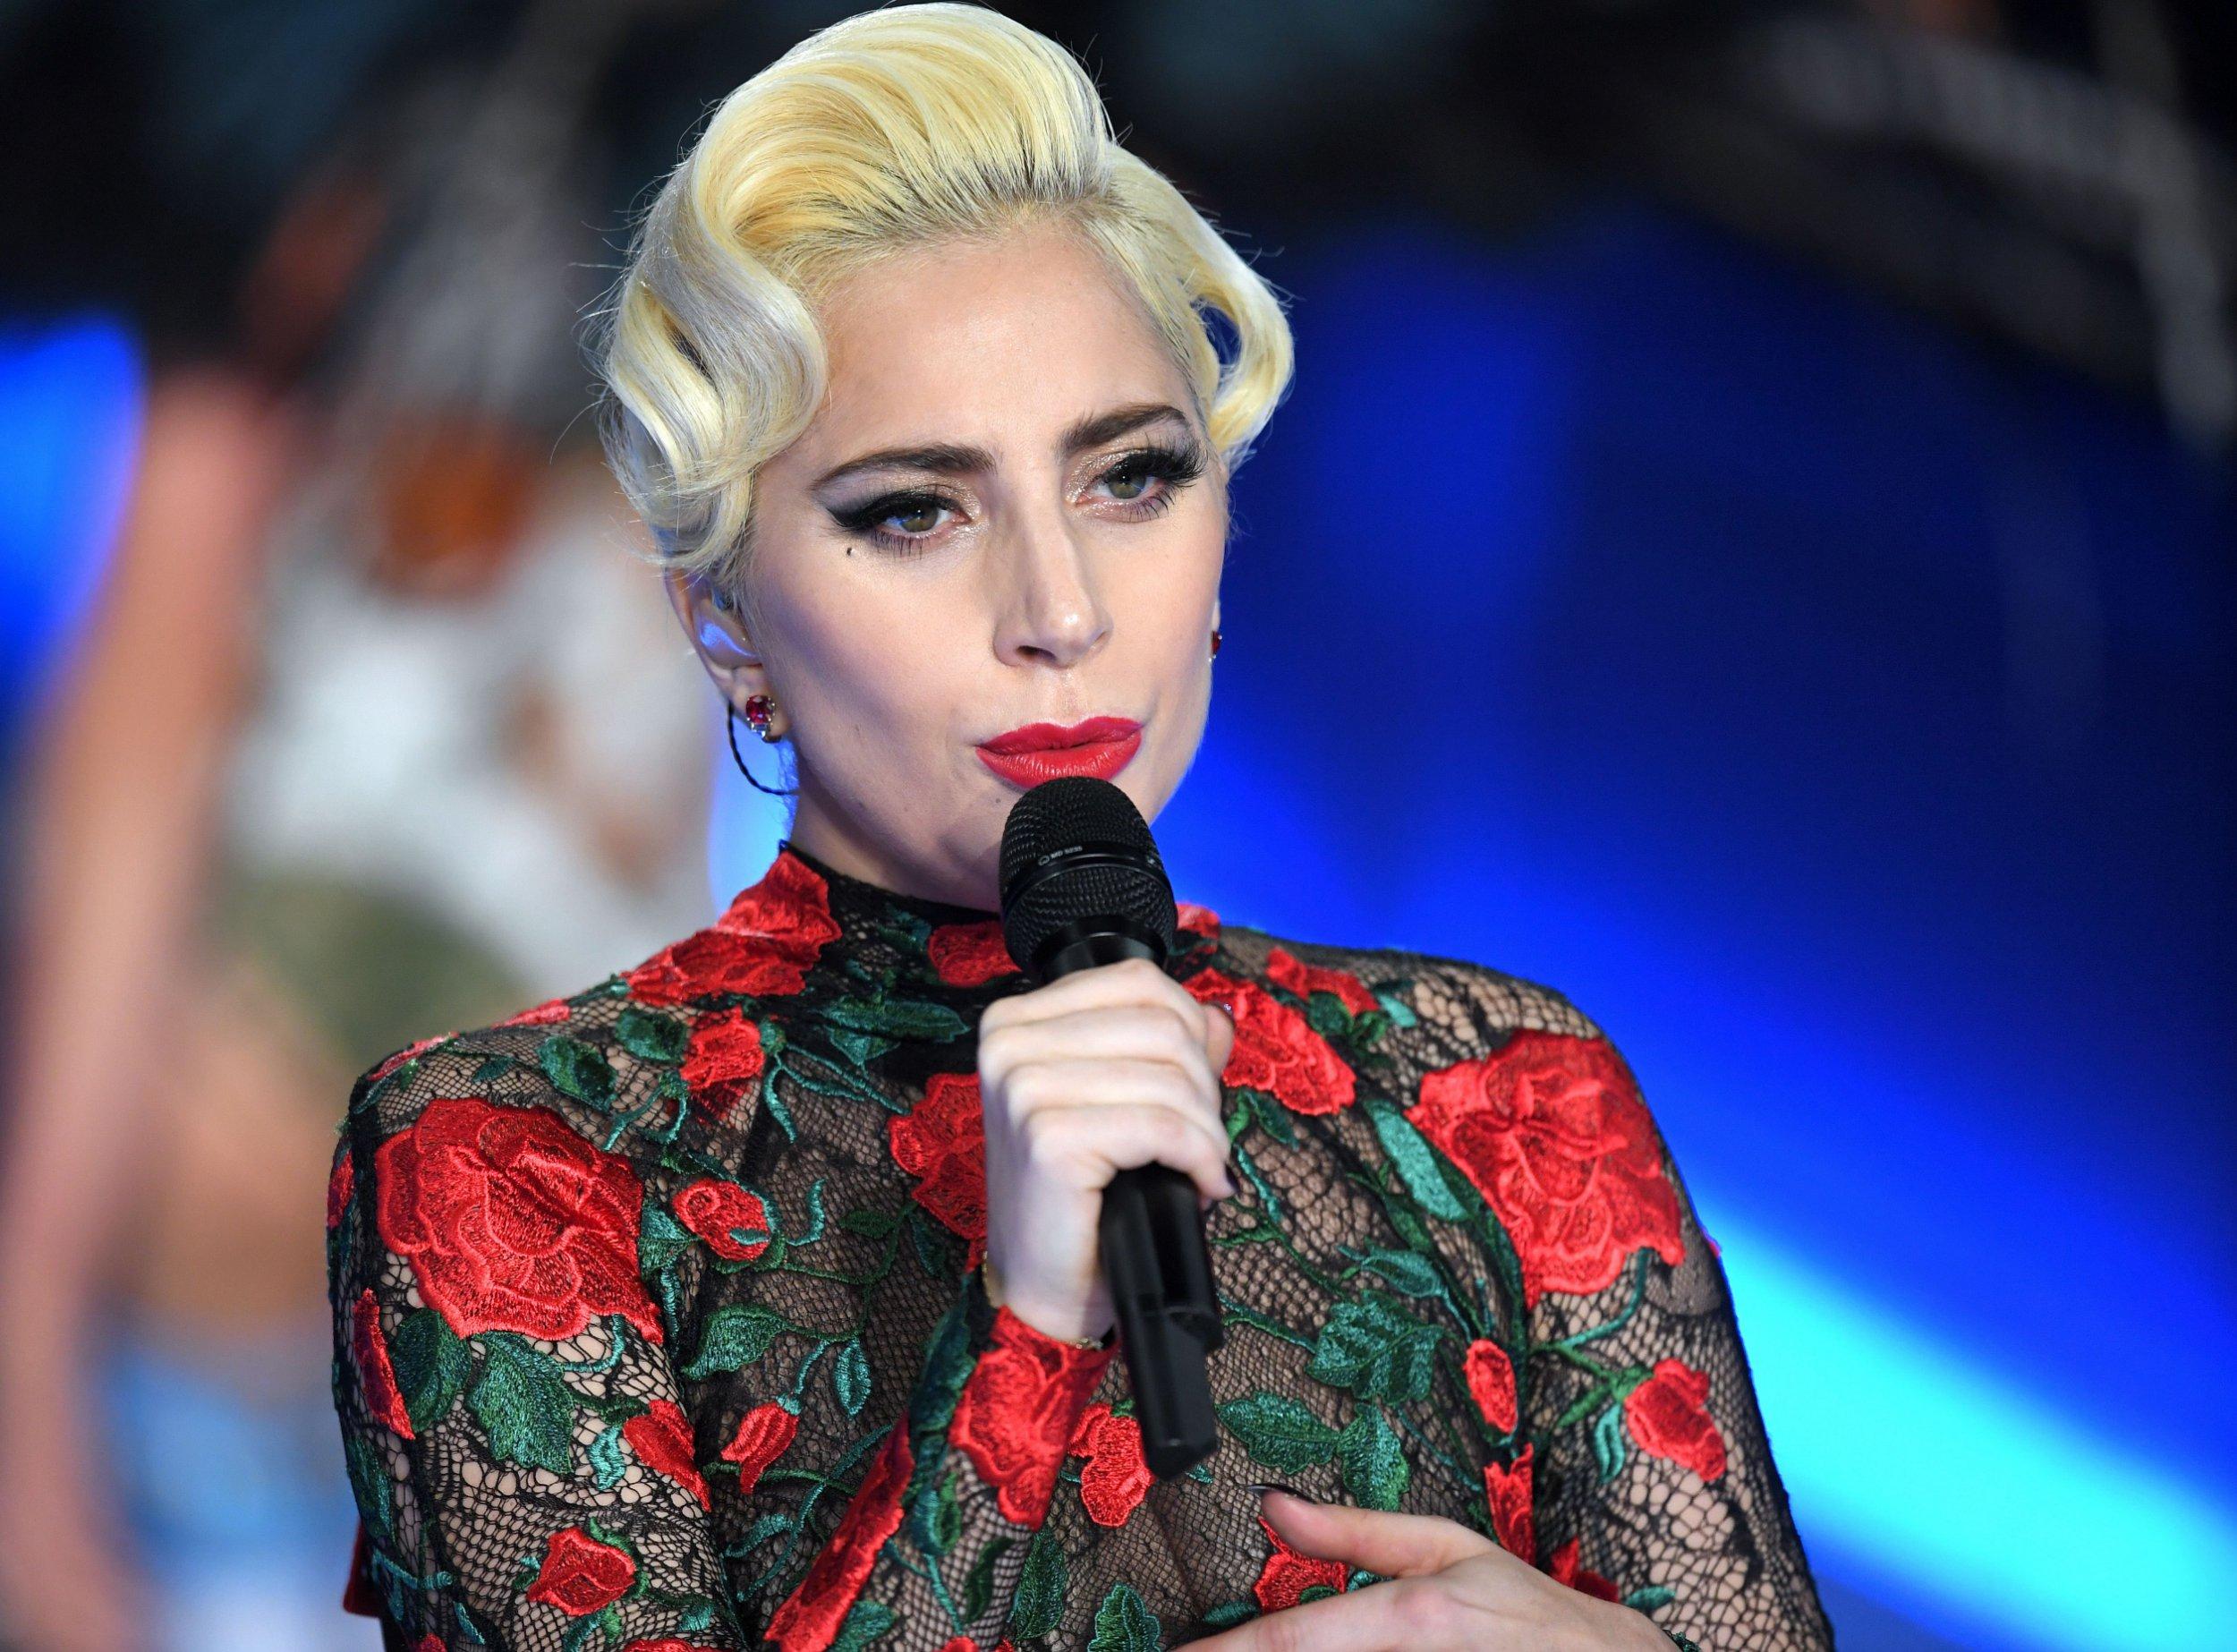 Mandatory Credit: Photo by David Fisher/REX/Shutterstock (7529849da) Lady Gaga performing on the catwalk Victoria's Secret Fashion Show, Runway, Grand Palais, Paris, France - 30 Nov 2016